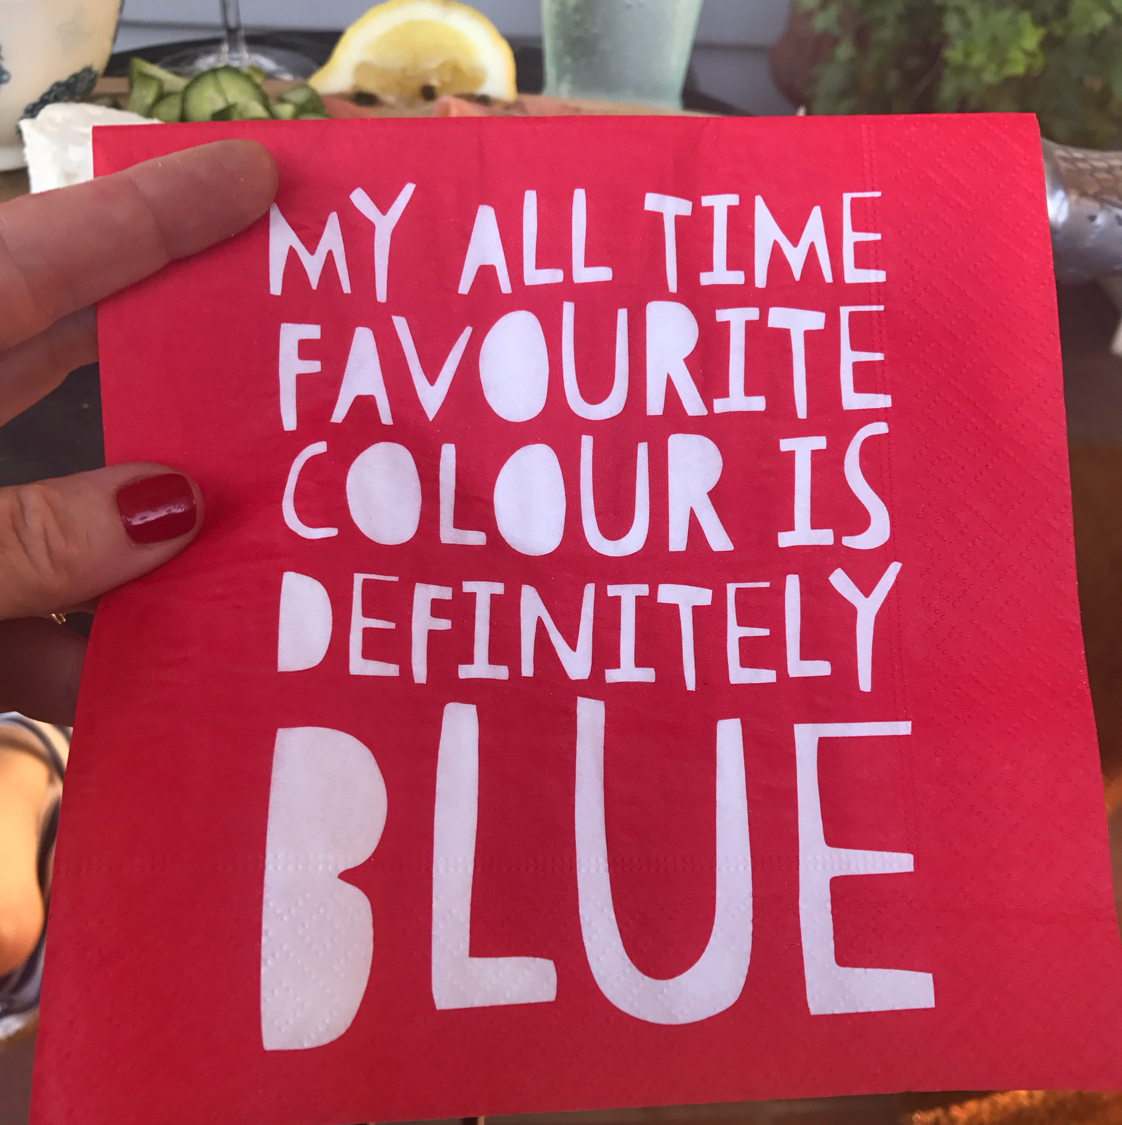 red napkin fave color blue